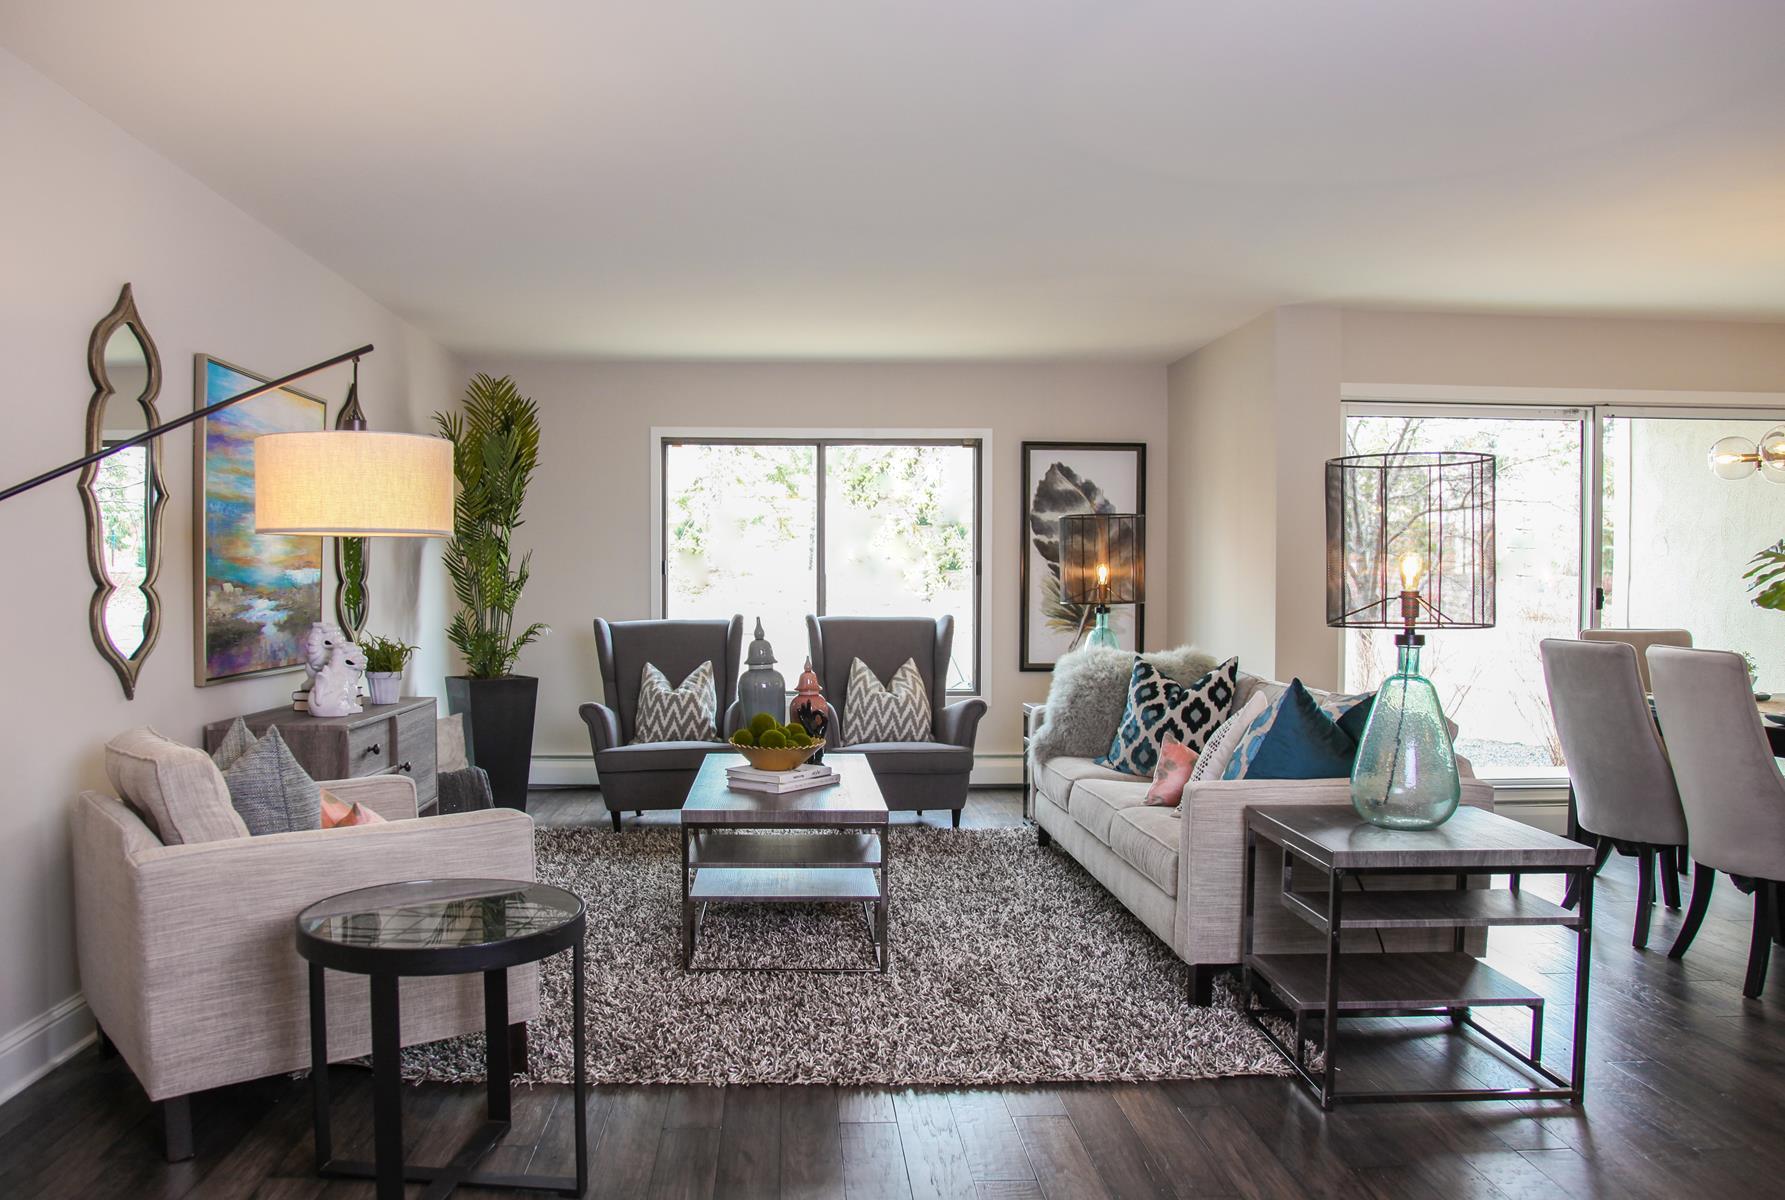 Condominium for Sale at 7220 York Avenue S #117 Edina, Minnesota, 55435 United States